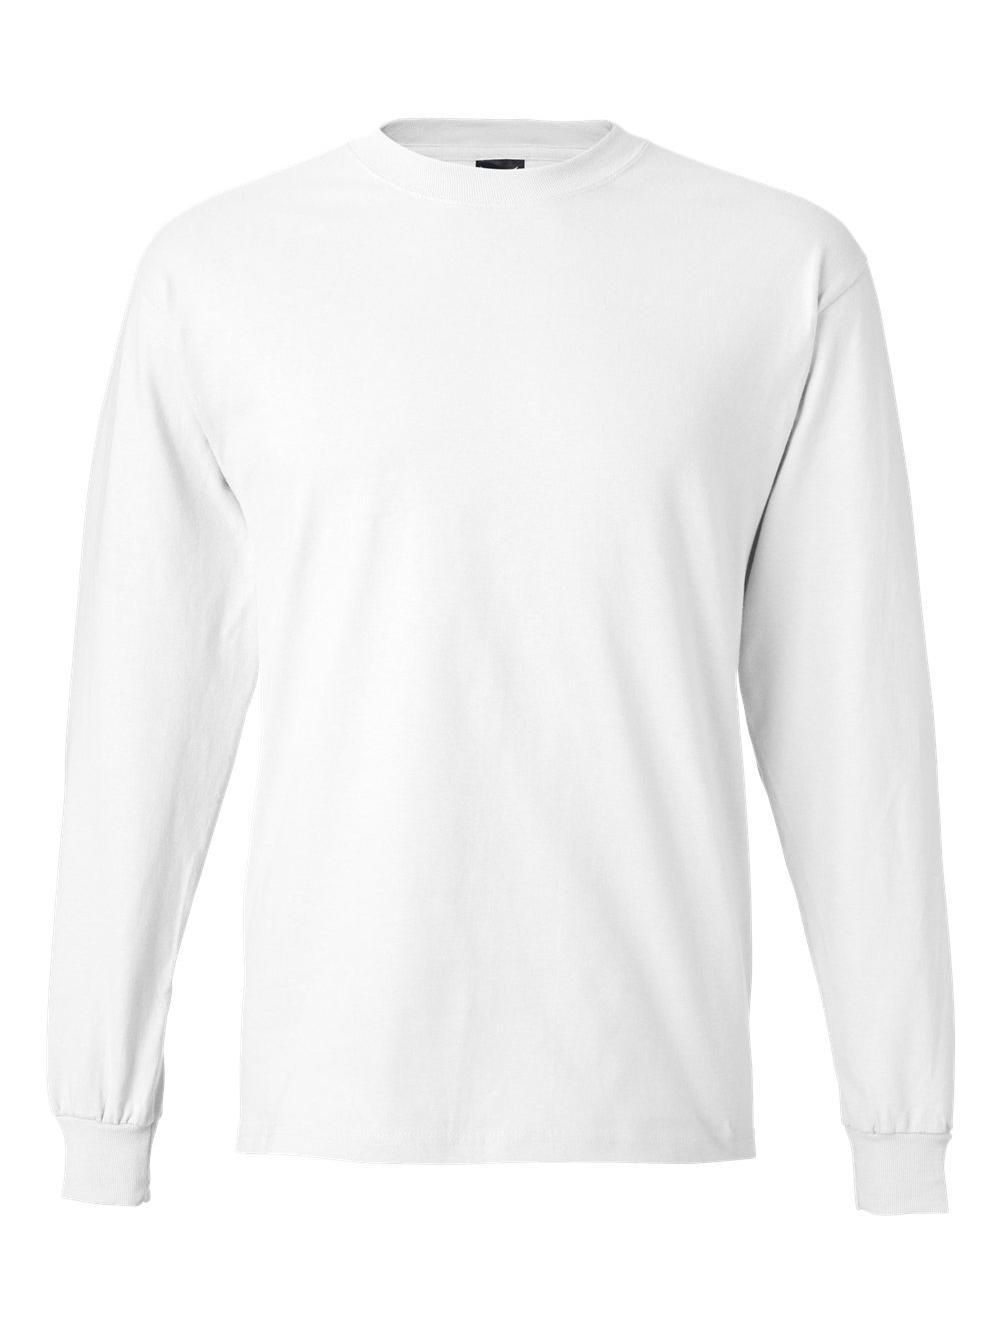 Hanes-Beefy-T-Long-Sleeve-T-Shirt-5186 thumbnail 54